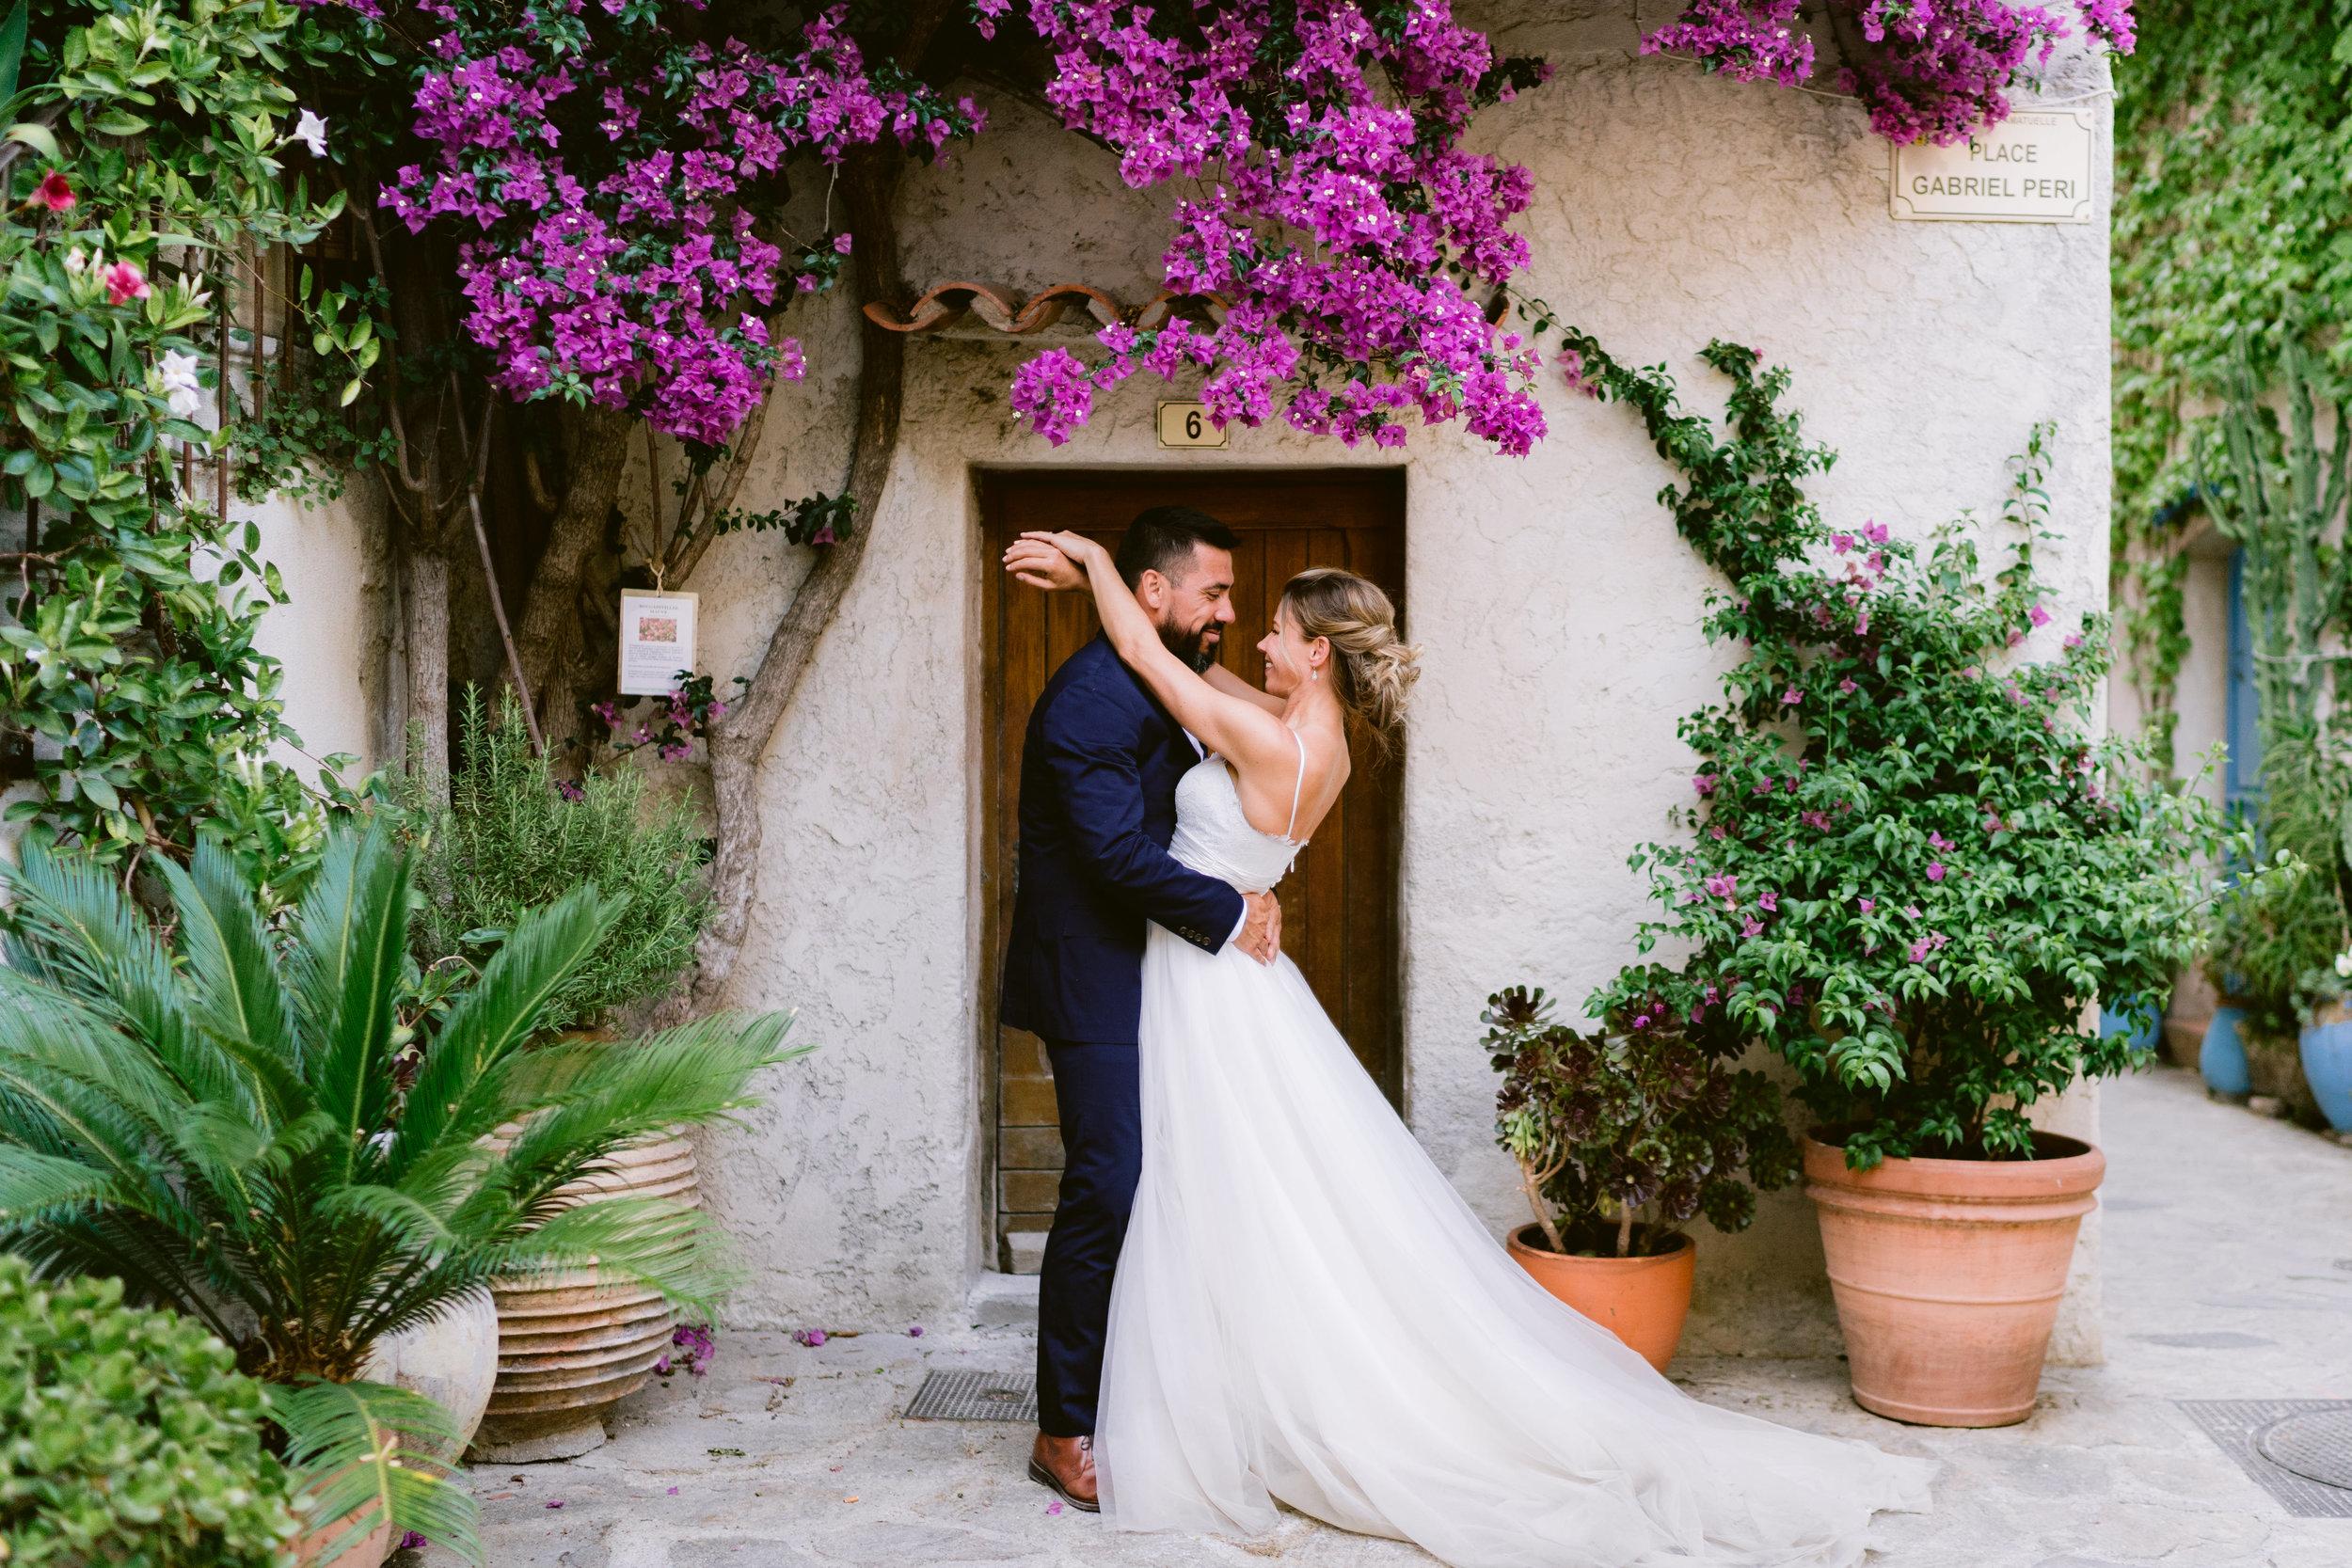 english photographer in france, wedding photographer saint tropez, romantic wedding photography france, chateau wedding france, cote d'azur wedding photographer, ramatuelle wedding (17).jpg